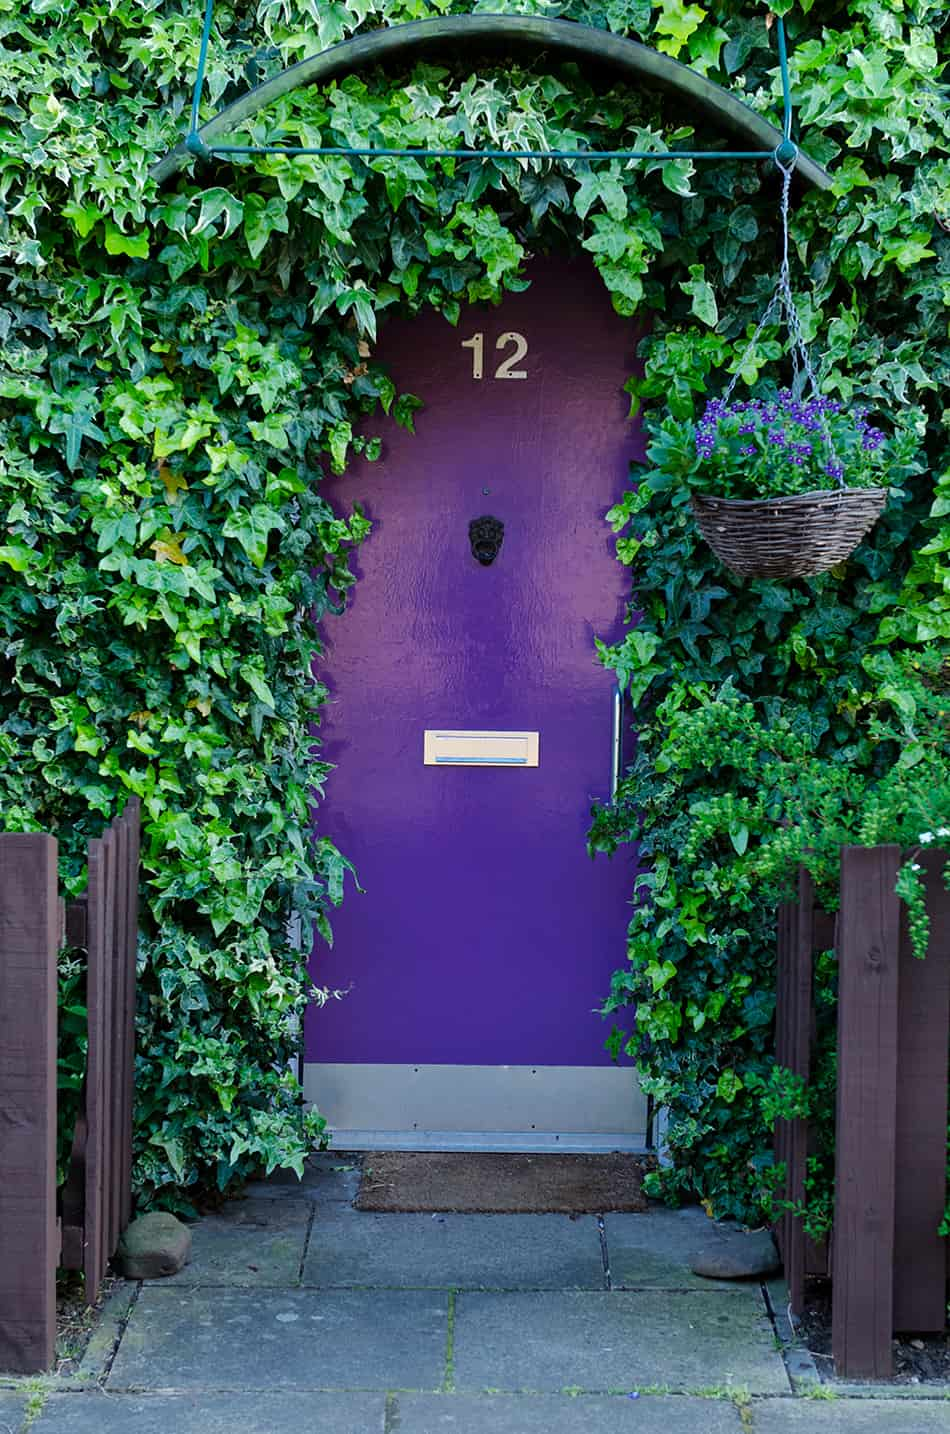 Purple Door Decorated with Hanging Plants